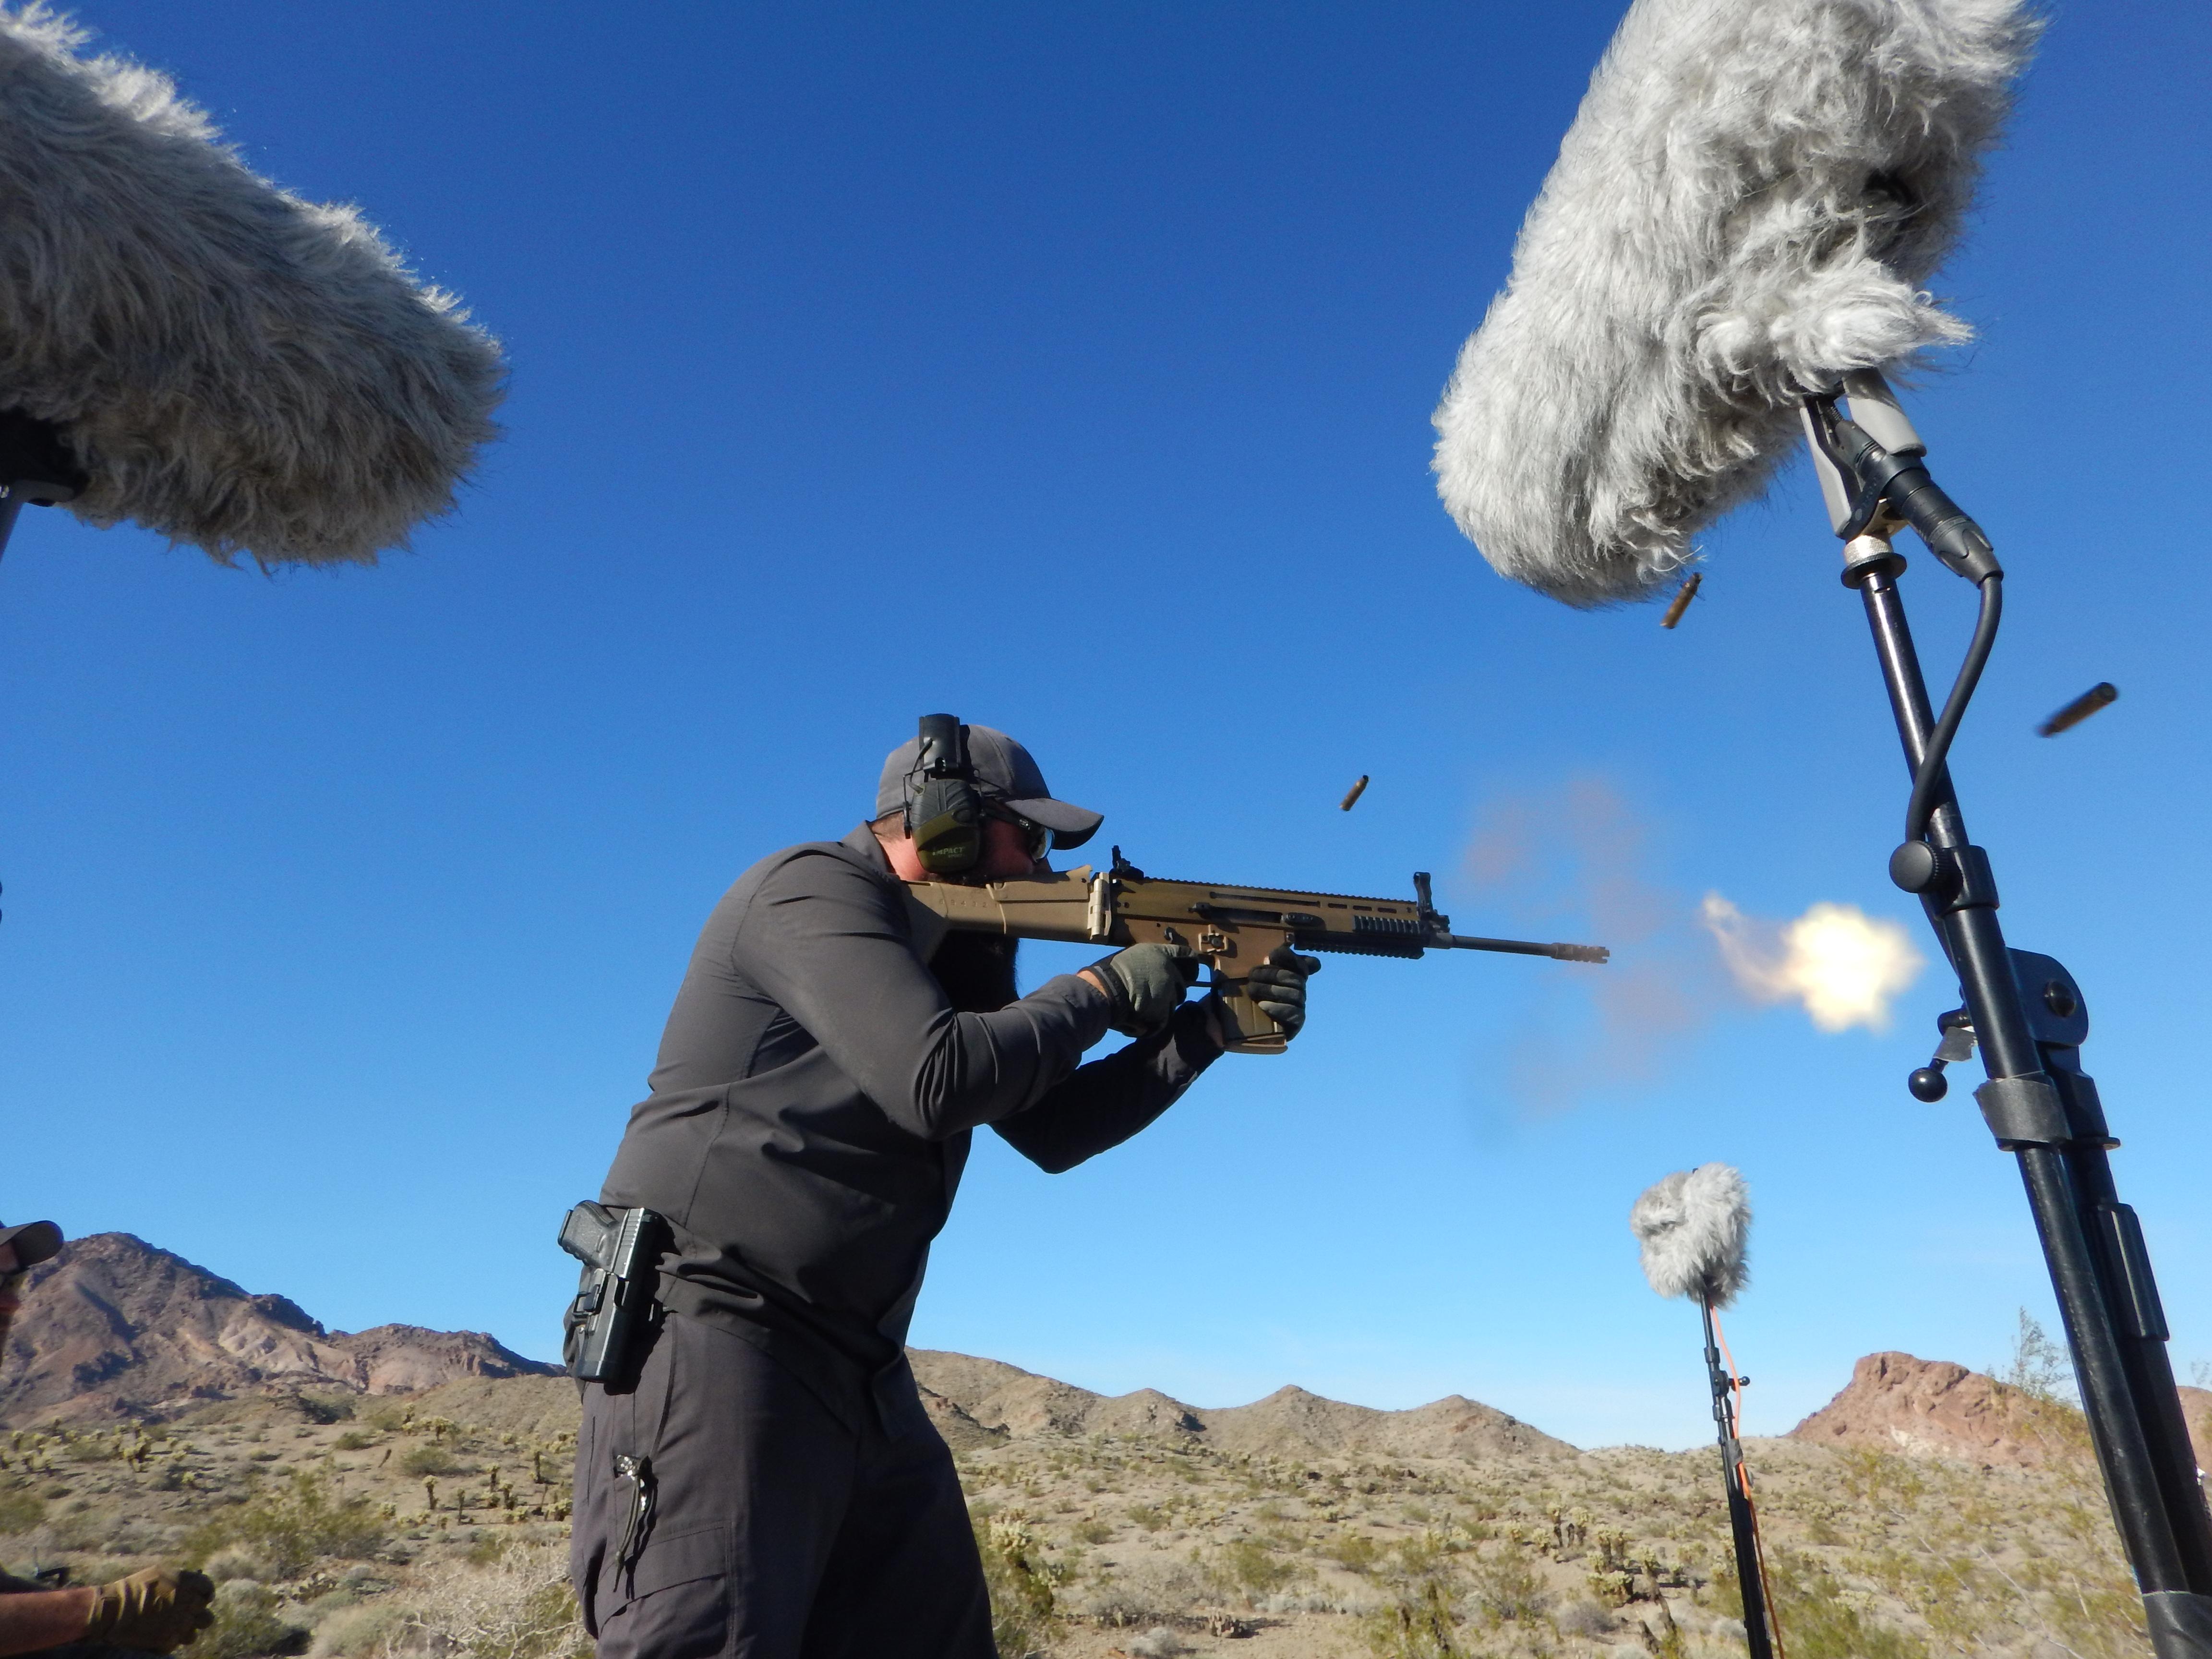 Gun DSCN2110 SCAR-H Muzzle Blast - Daniel